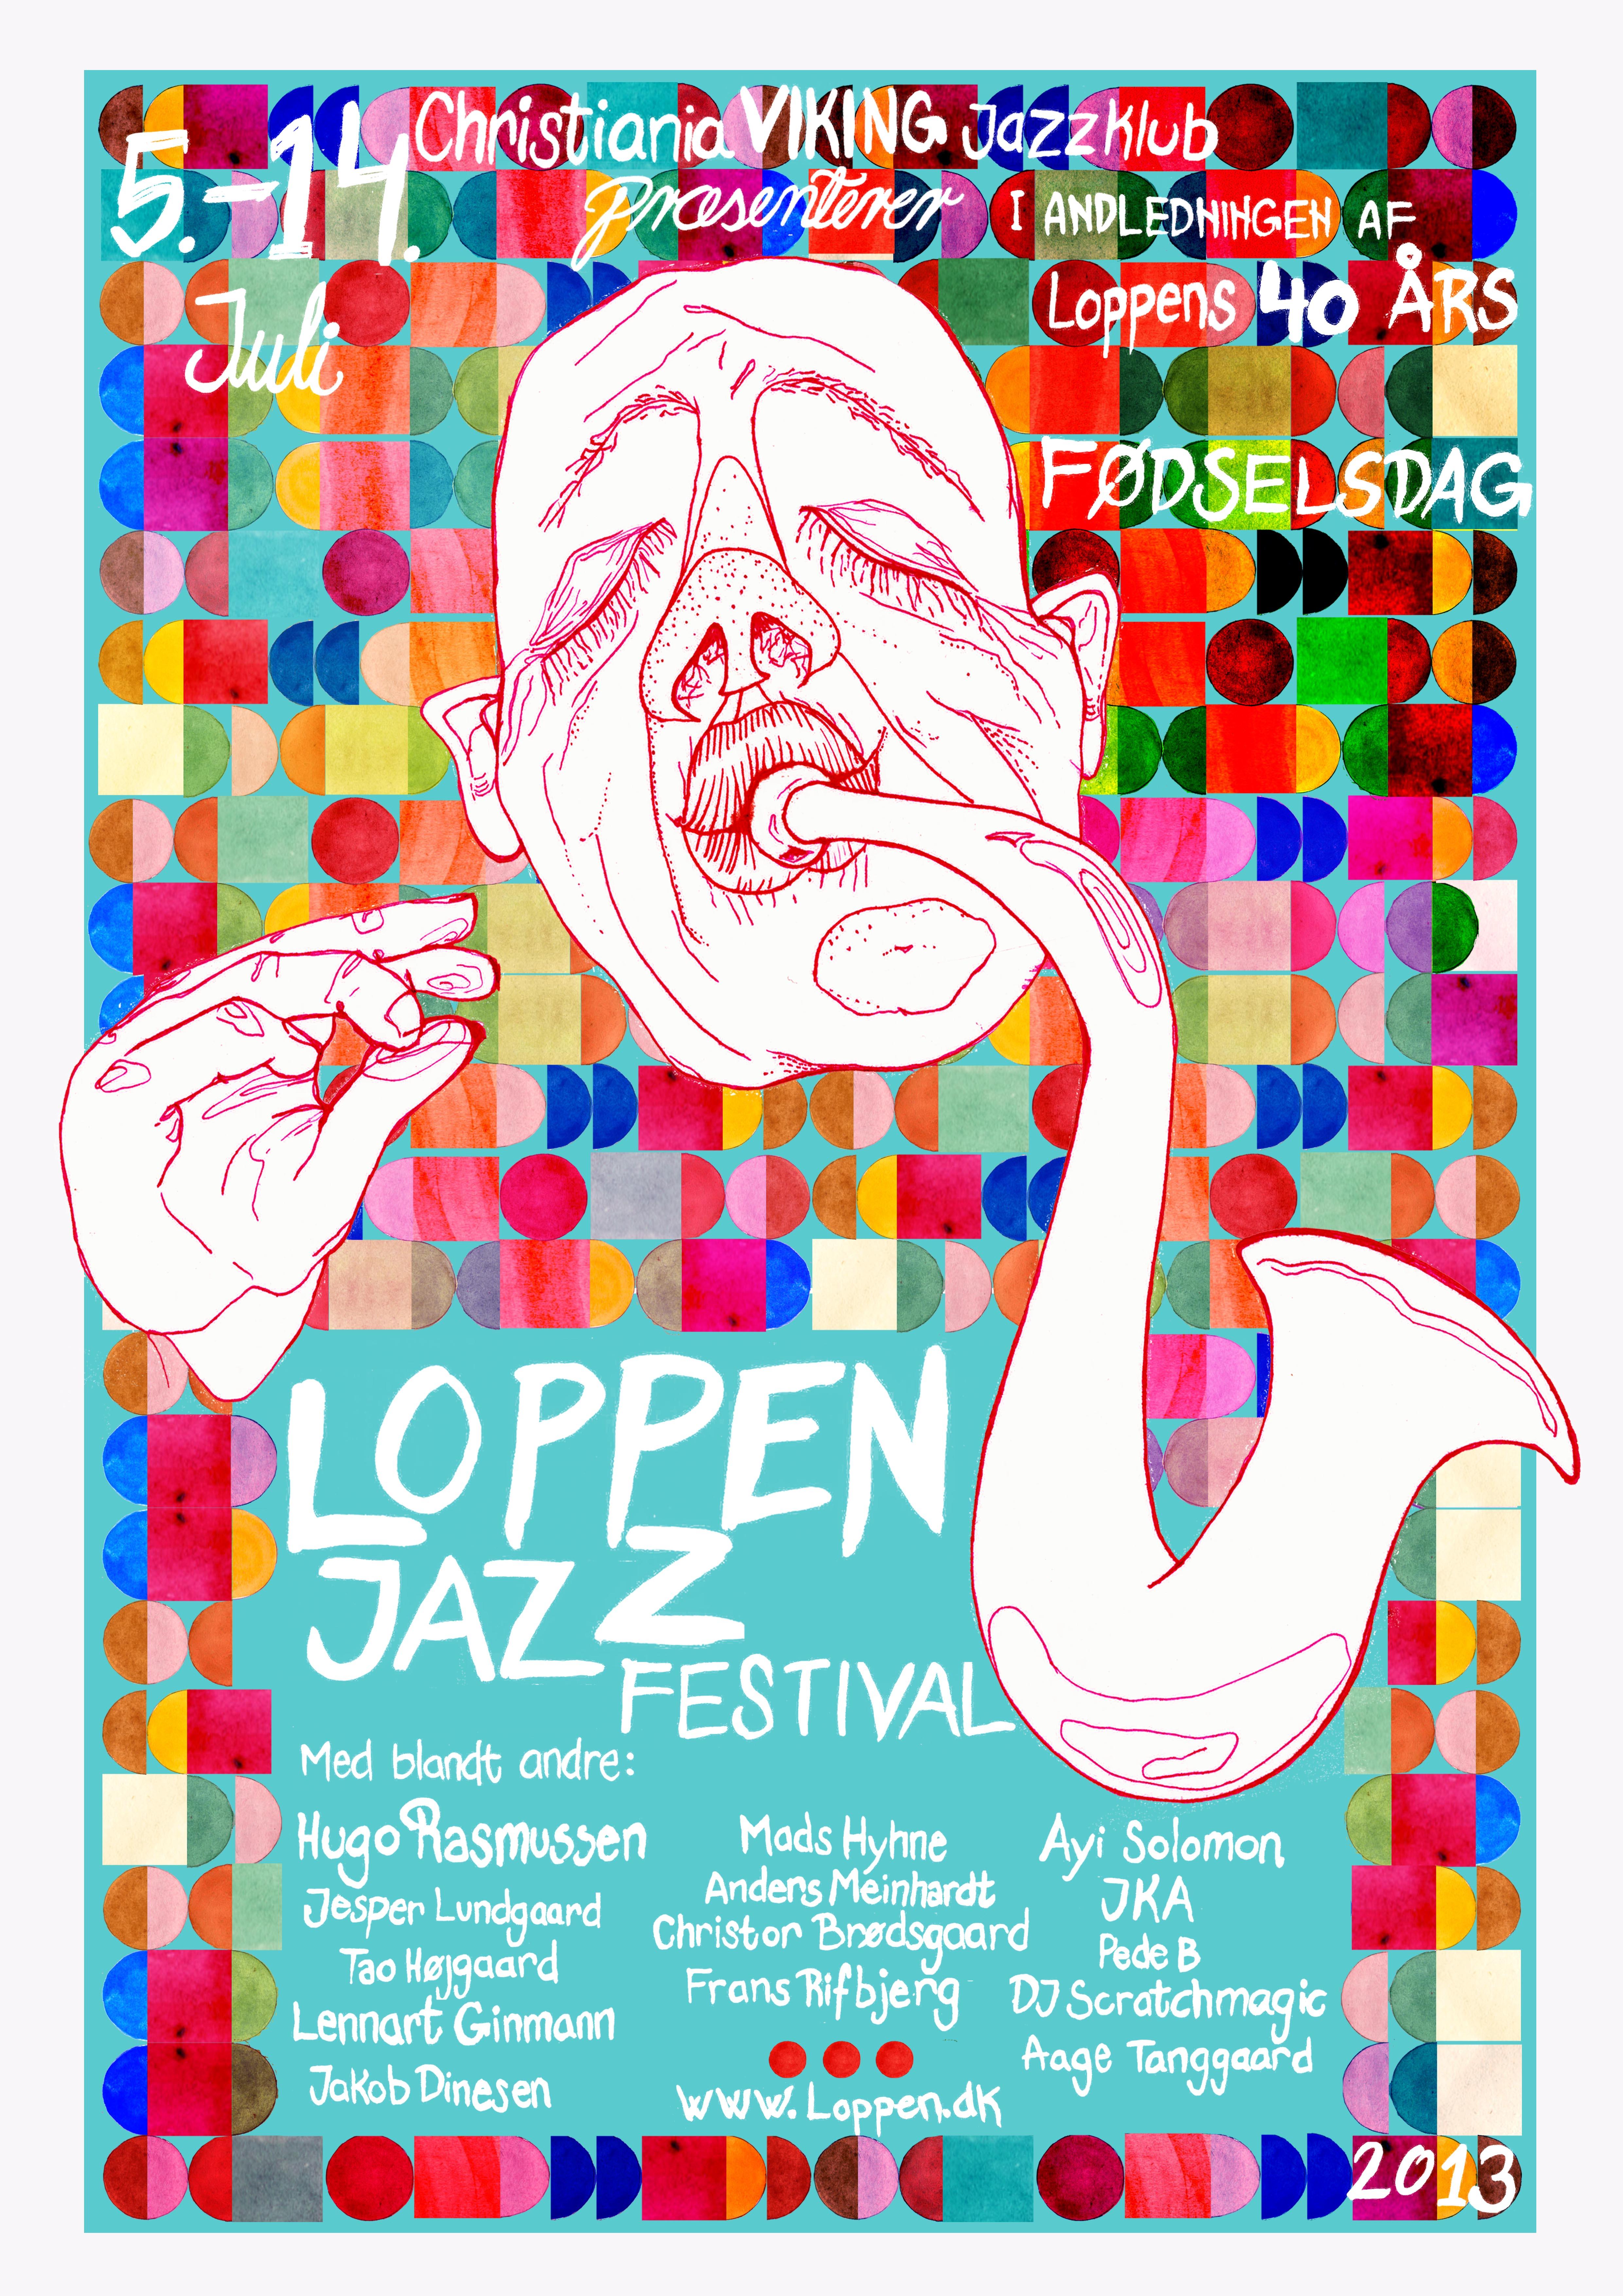 Plakat A2, Loppen, Jazzfestival